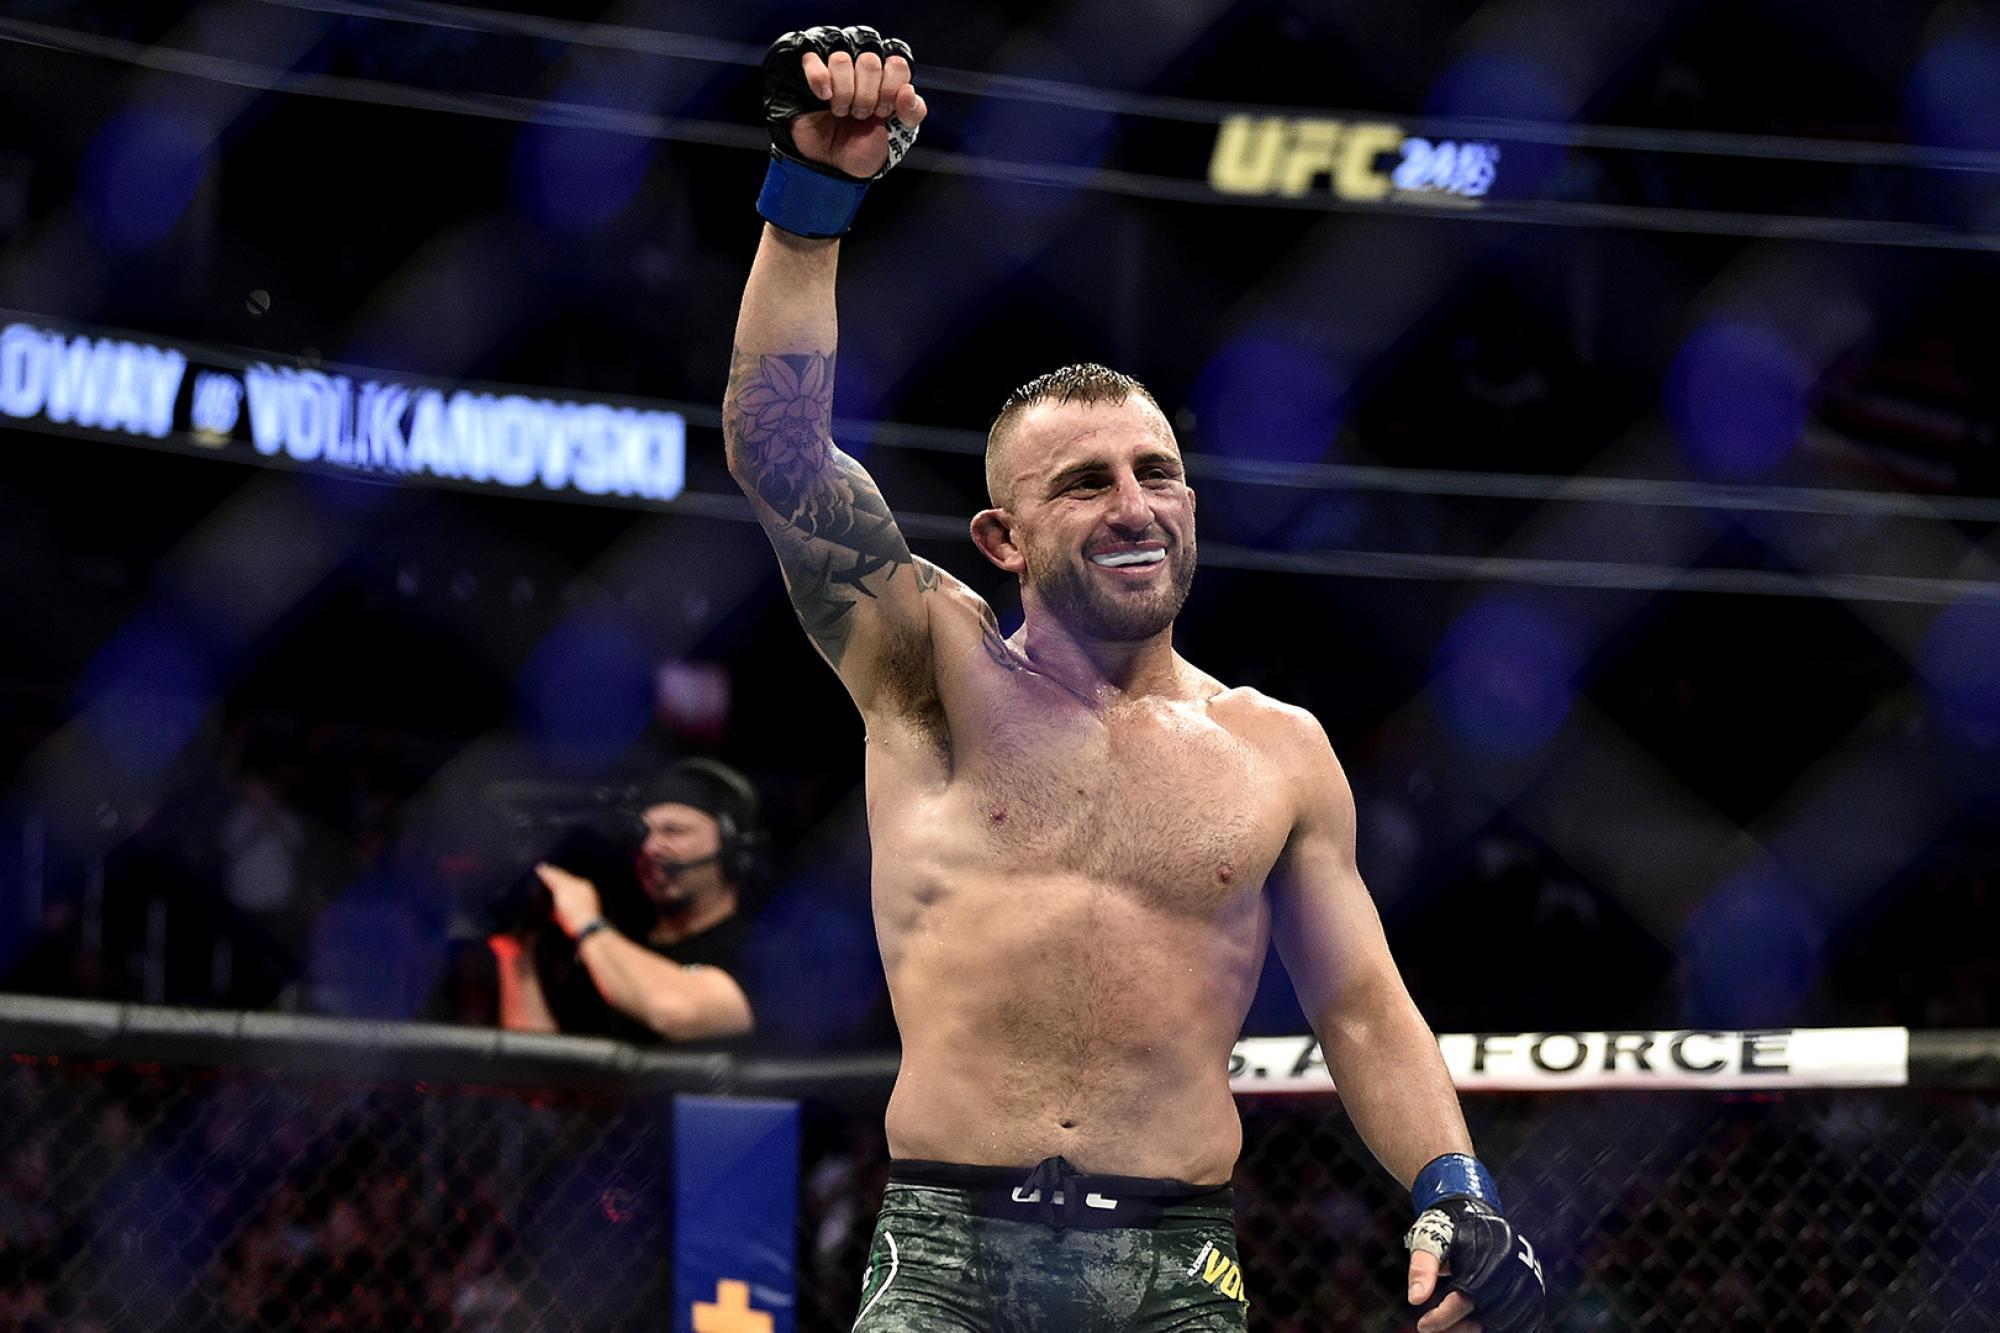 Alexander Volkanovski | UFC